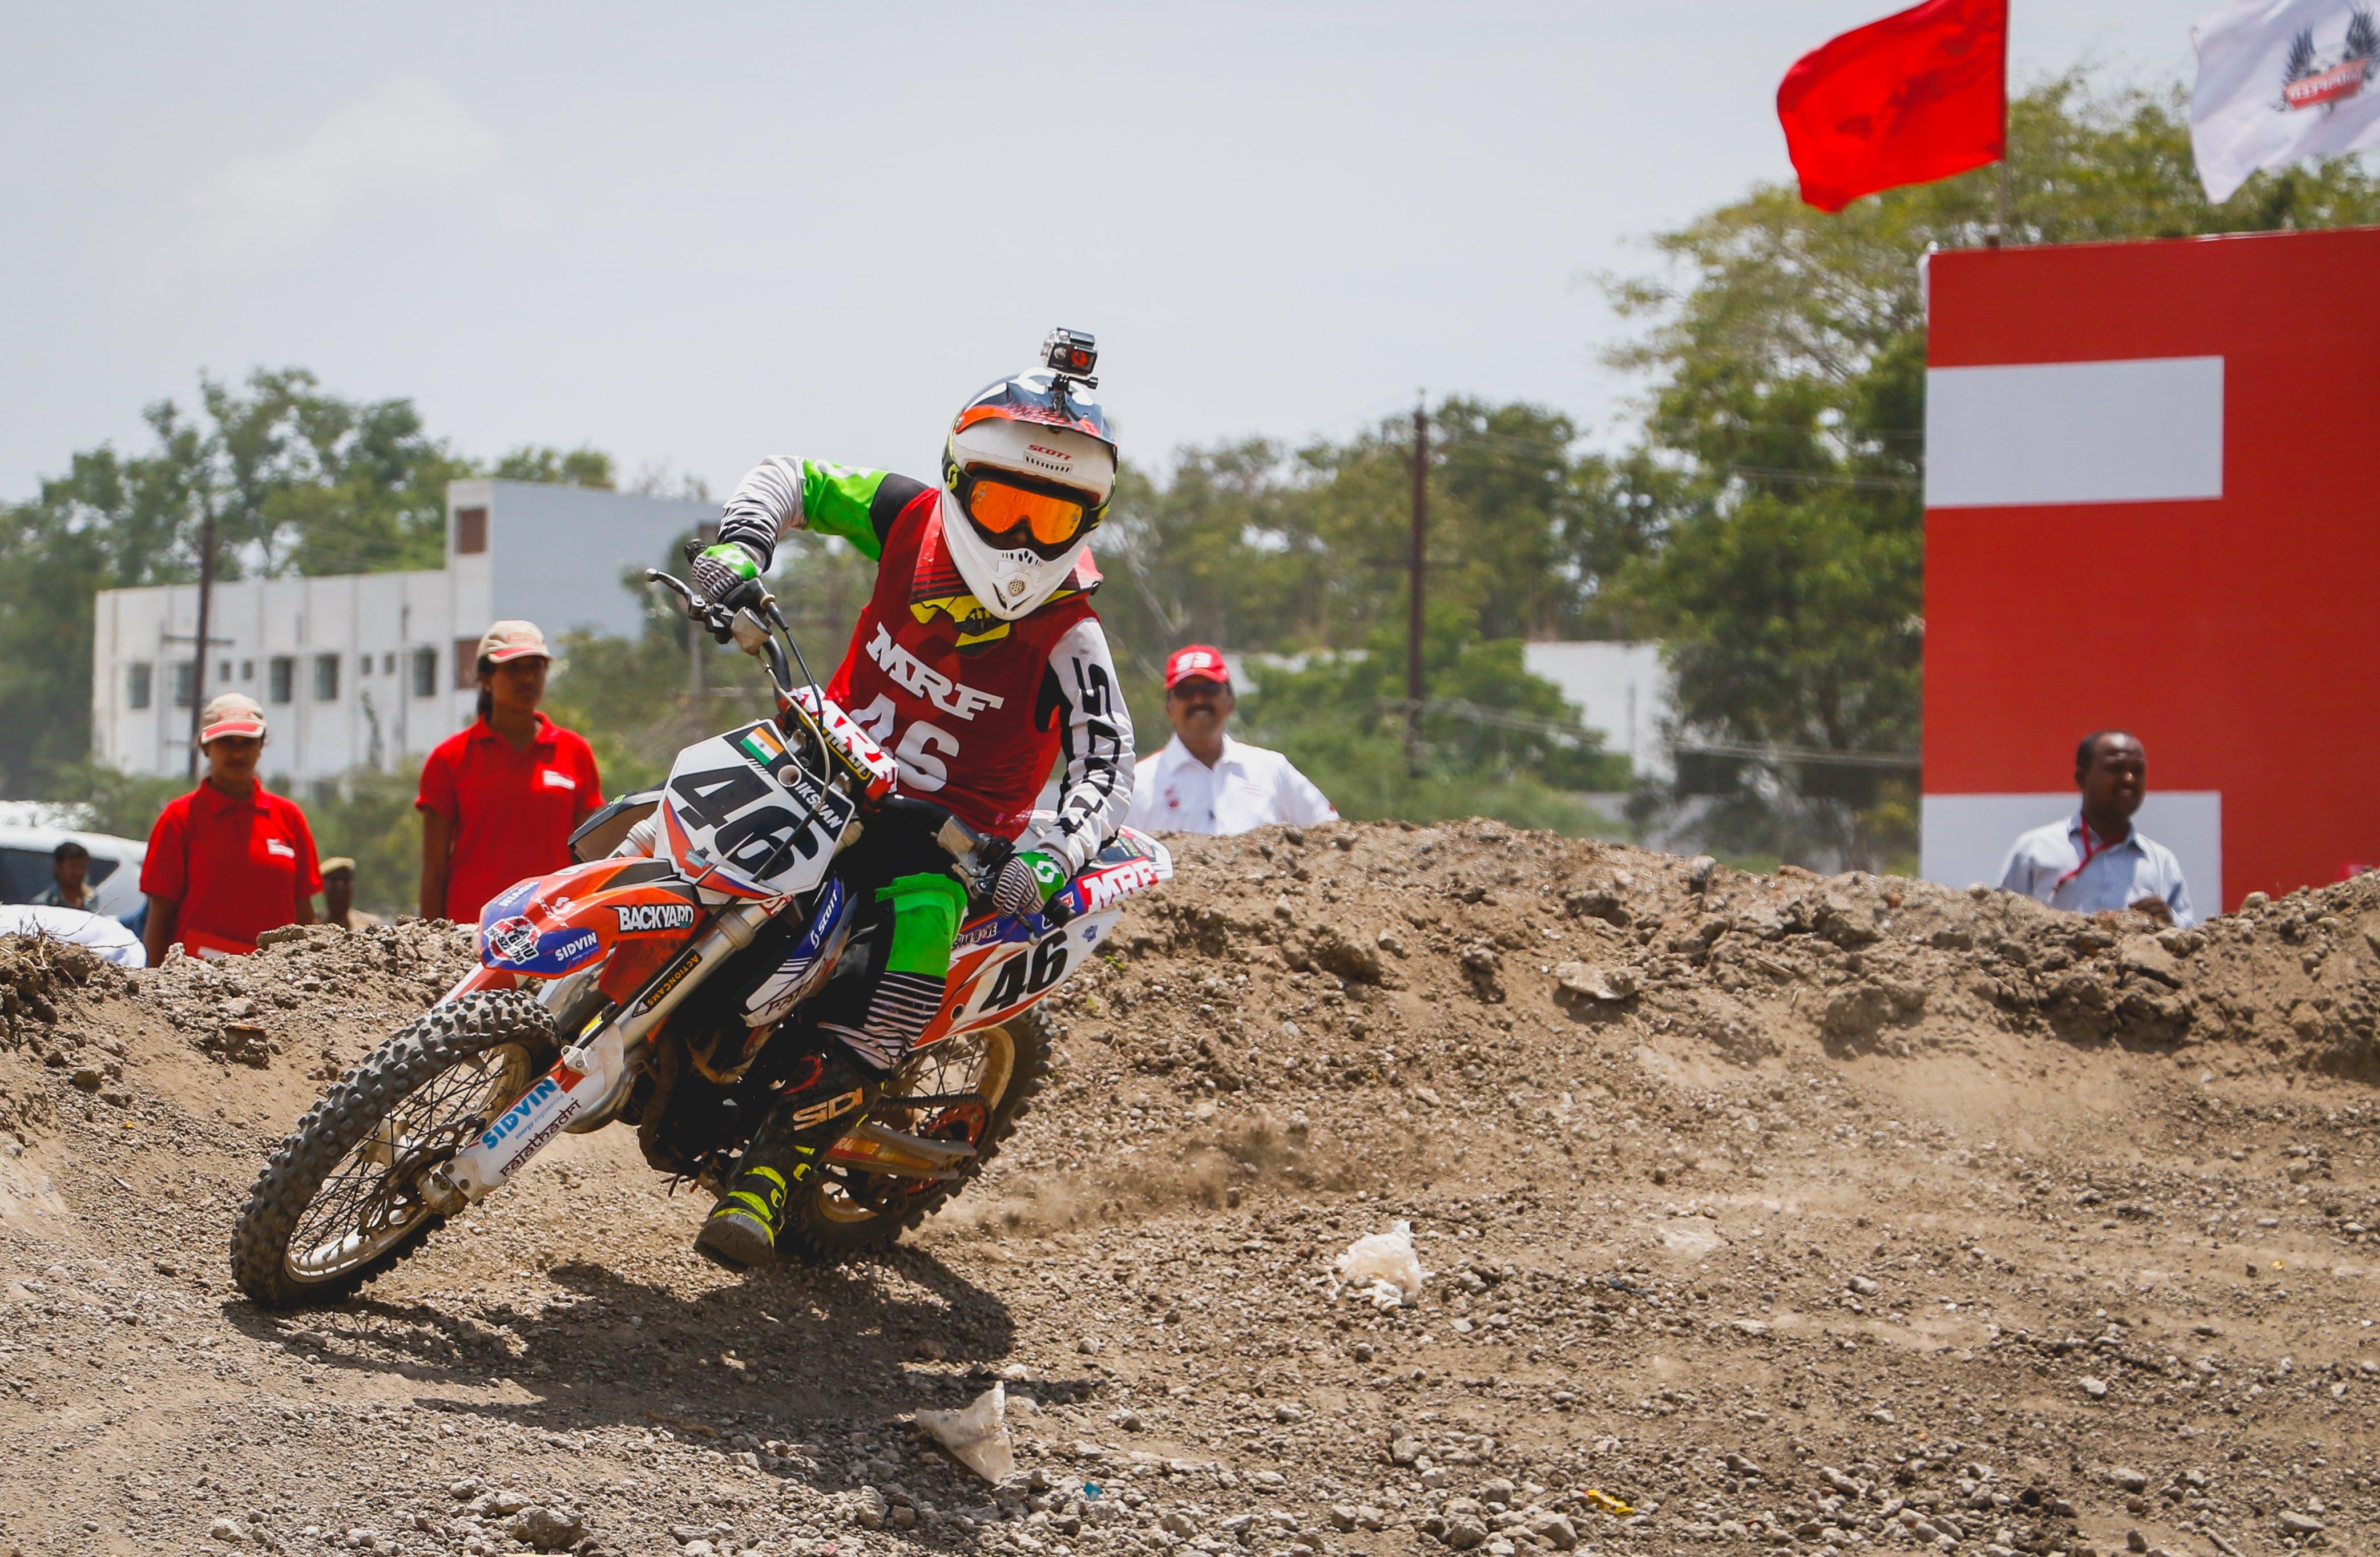 Free stock photo of action, bike racing, dirt, dirt bike